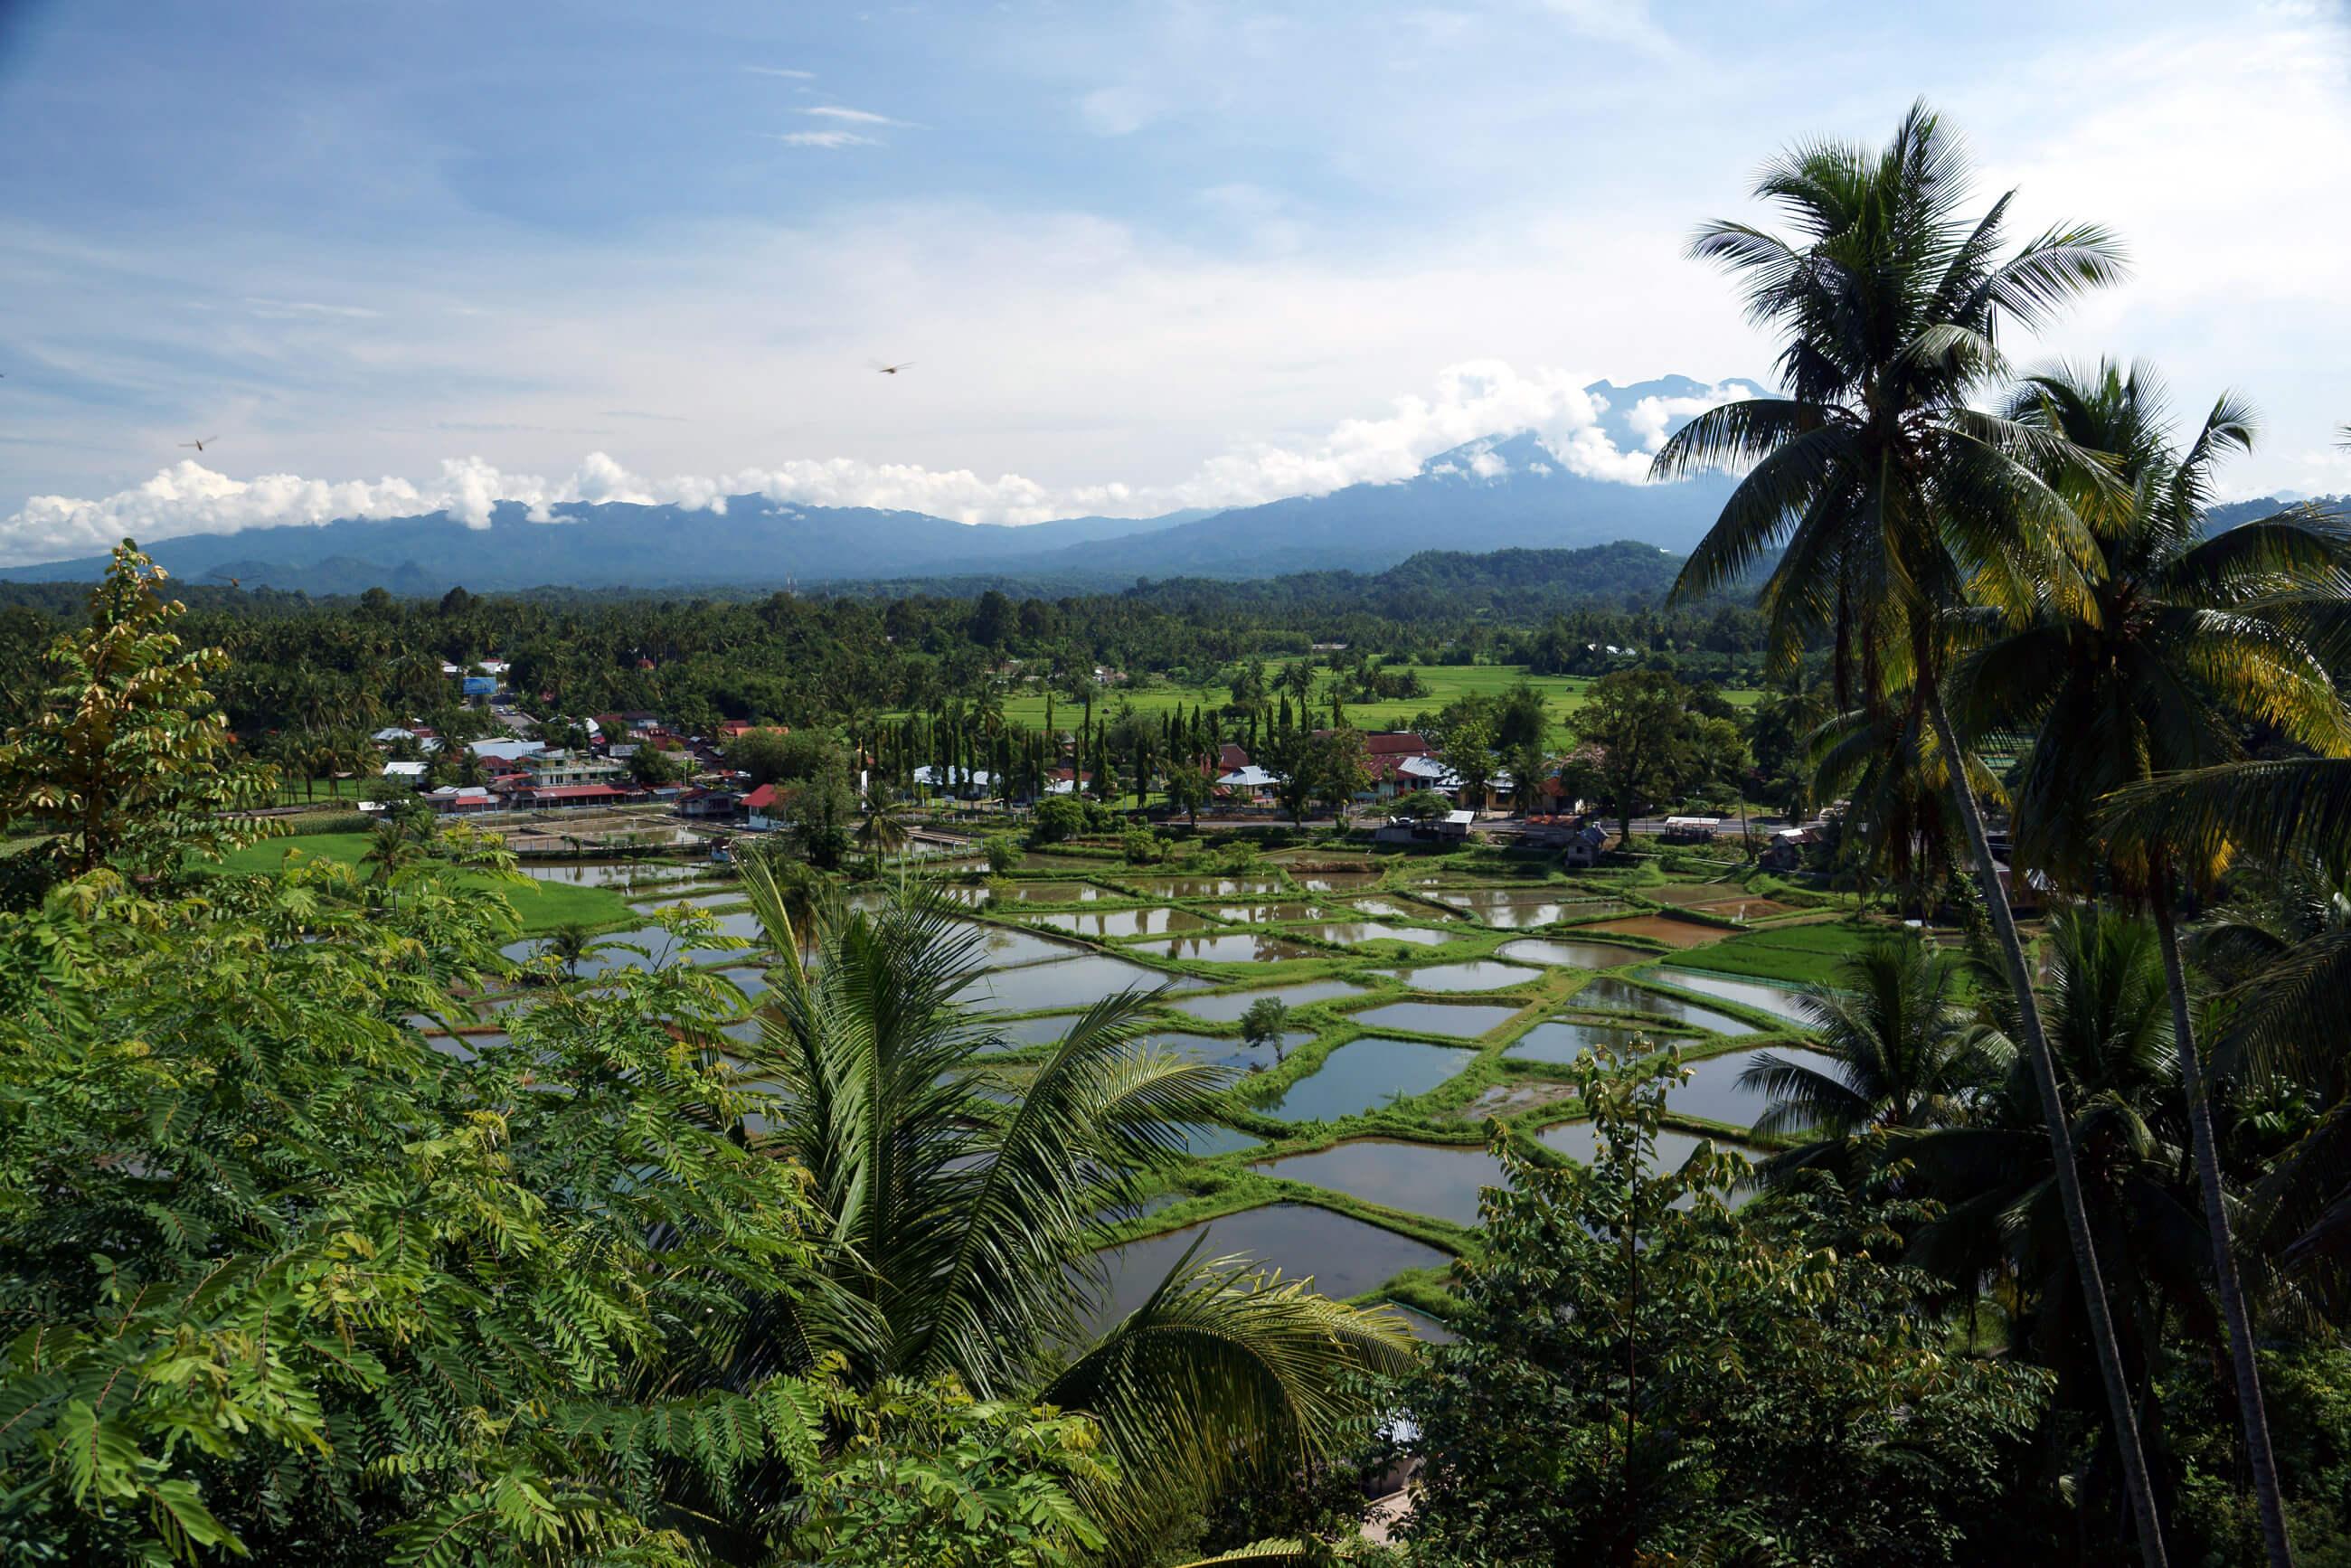 https://bubo.sk/uploads/galleries/7396/archiv_jozefzeliznakst_indonezia_sumatra_05-2014-222-.jpg